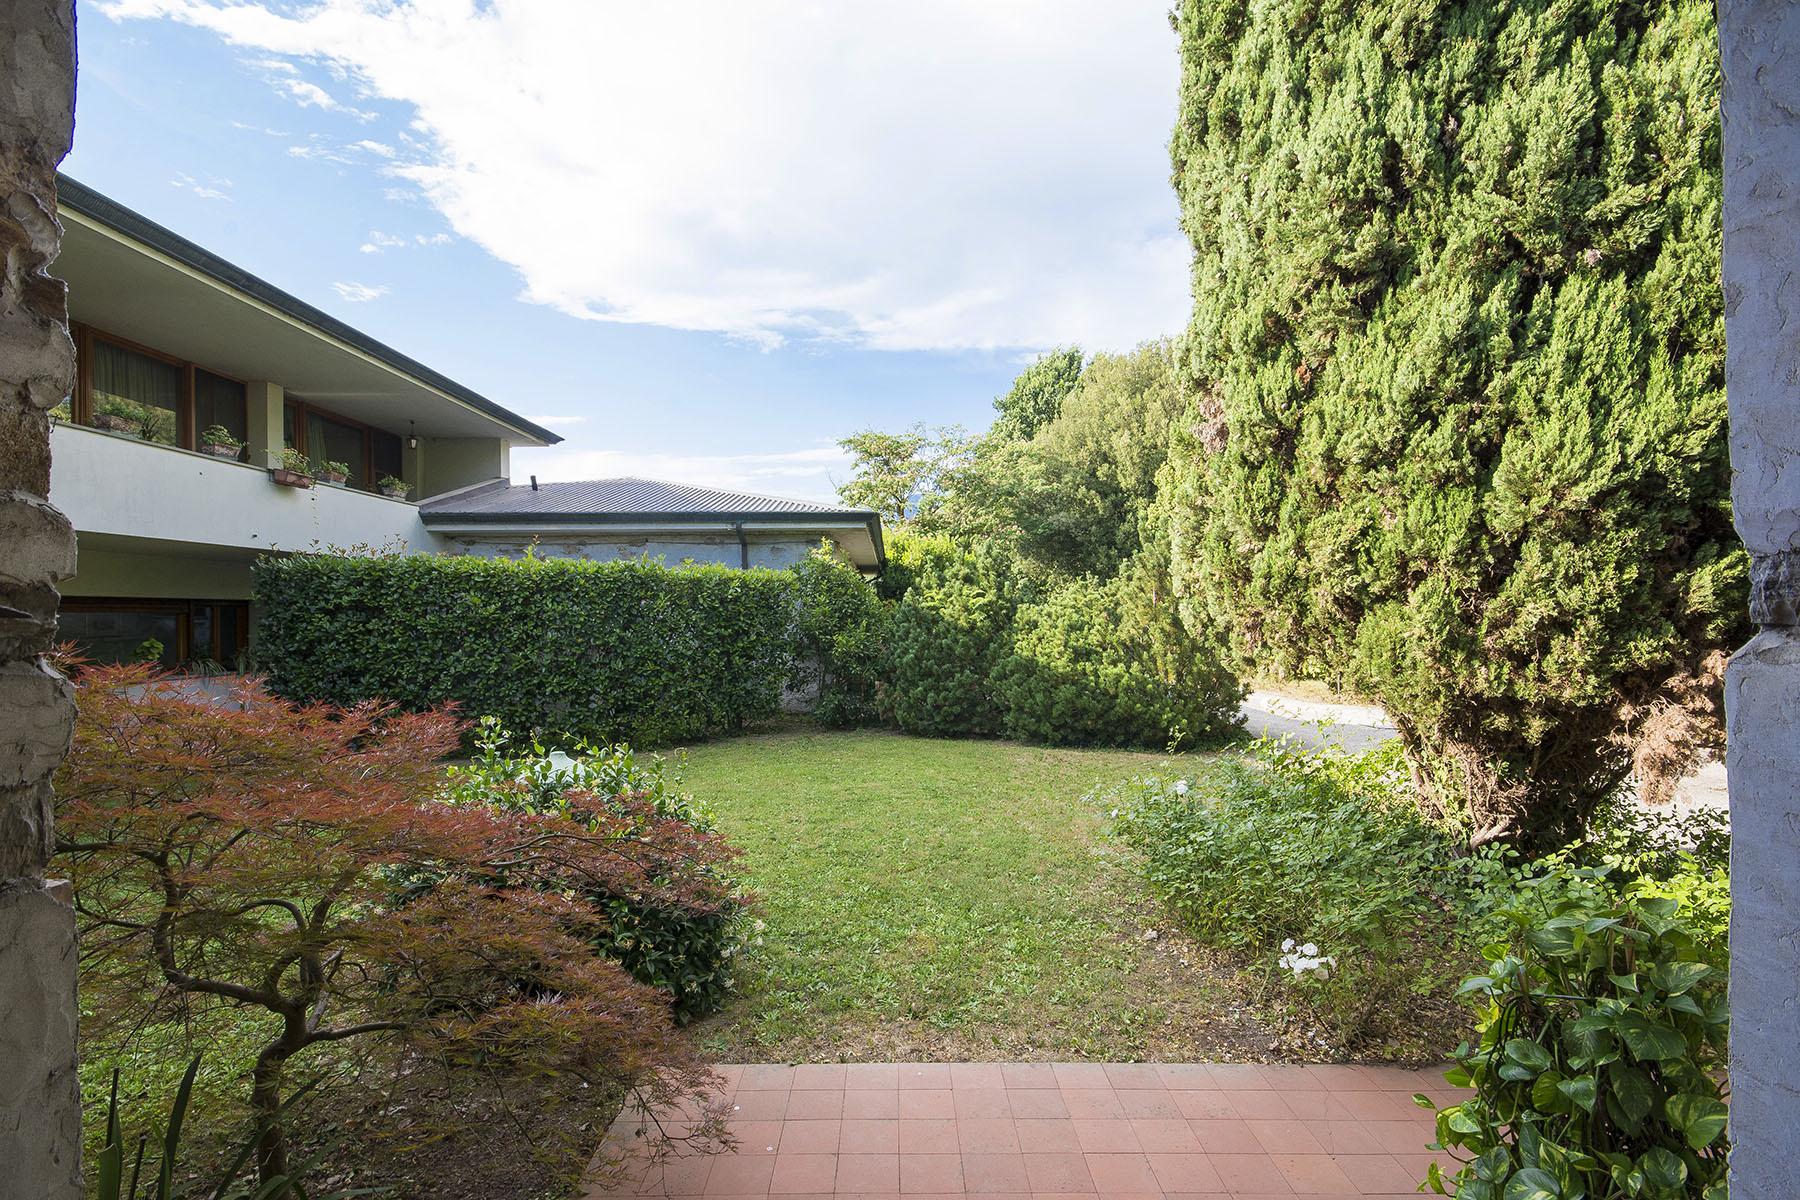 Villa in Vendita a Capannori: 5 locali, 500 mq - Foto 21